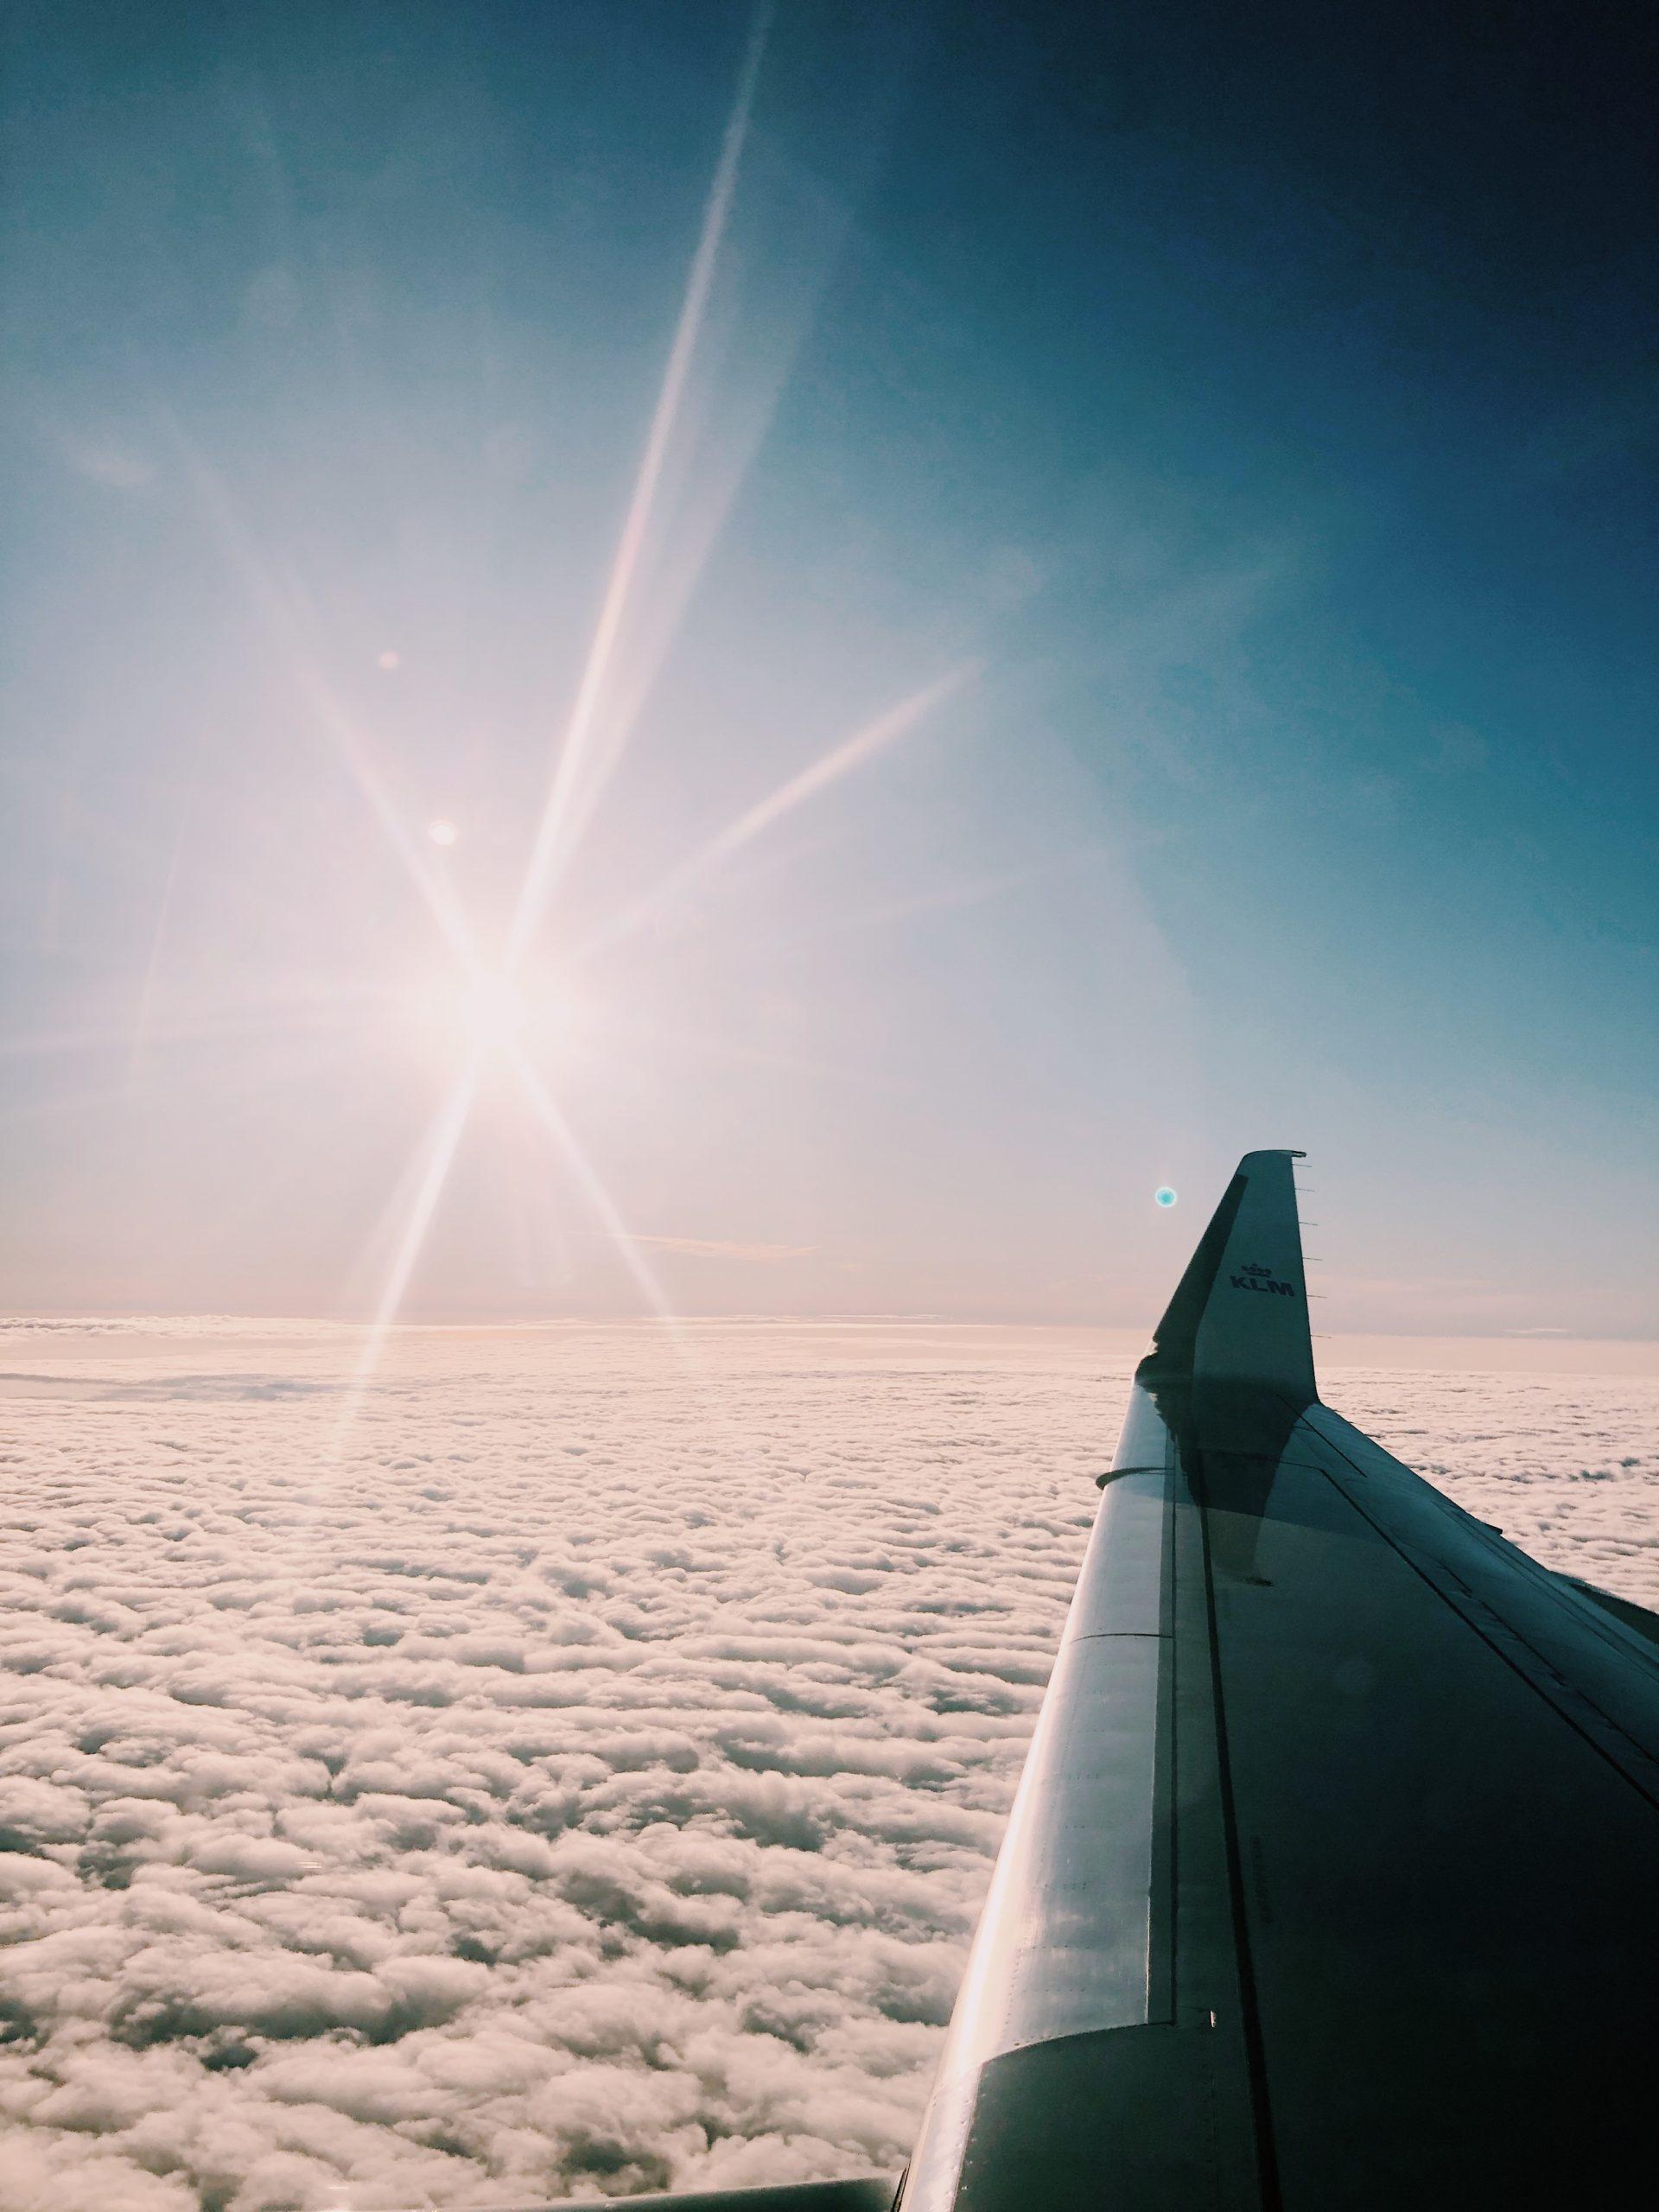 corona op reis CoronaCheck-app Solon Travel wijsopreis vliegen